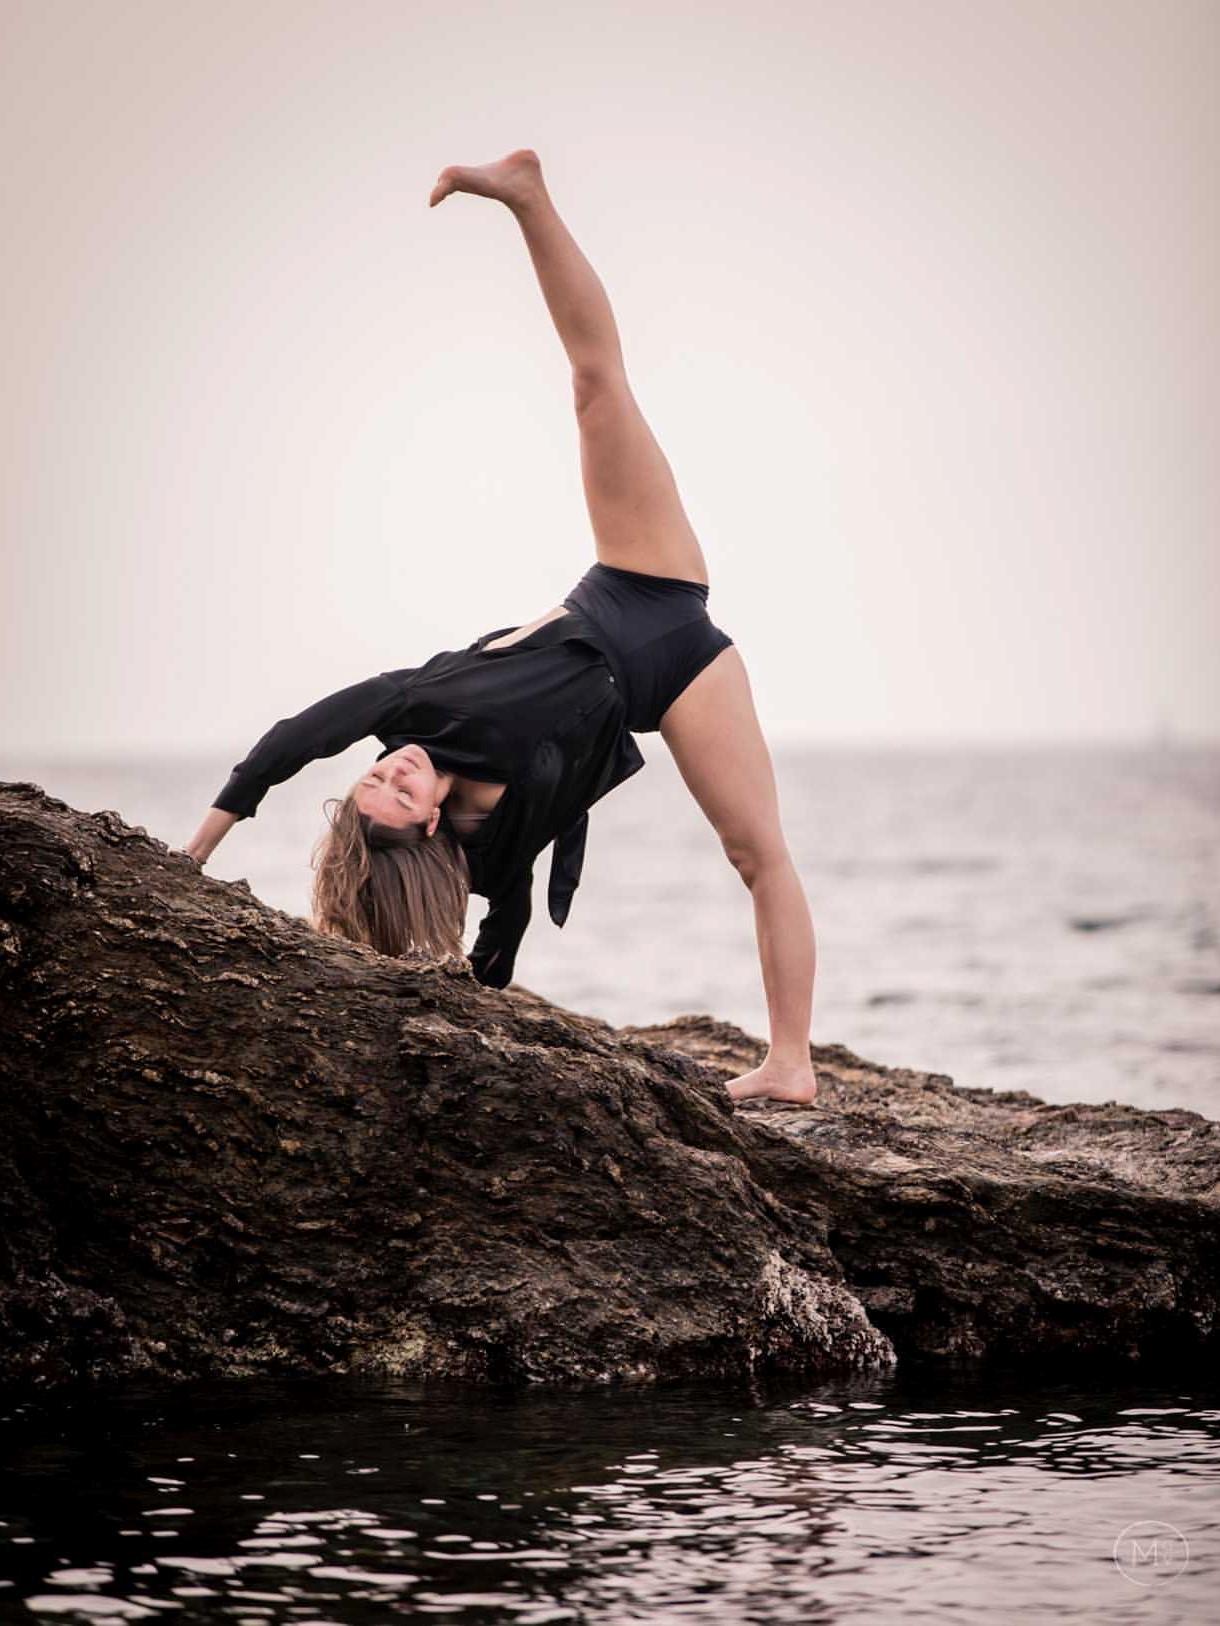 manon g-viaphotographe ecole de danse carla raiess ollioules